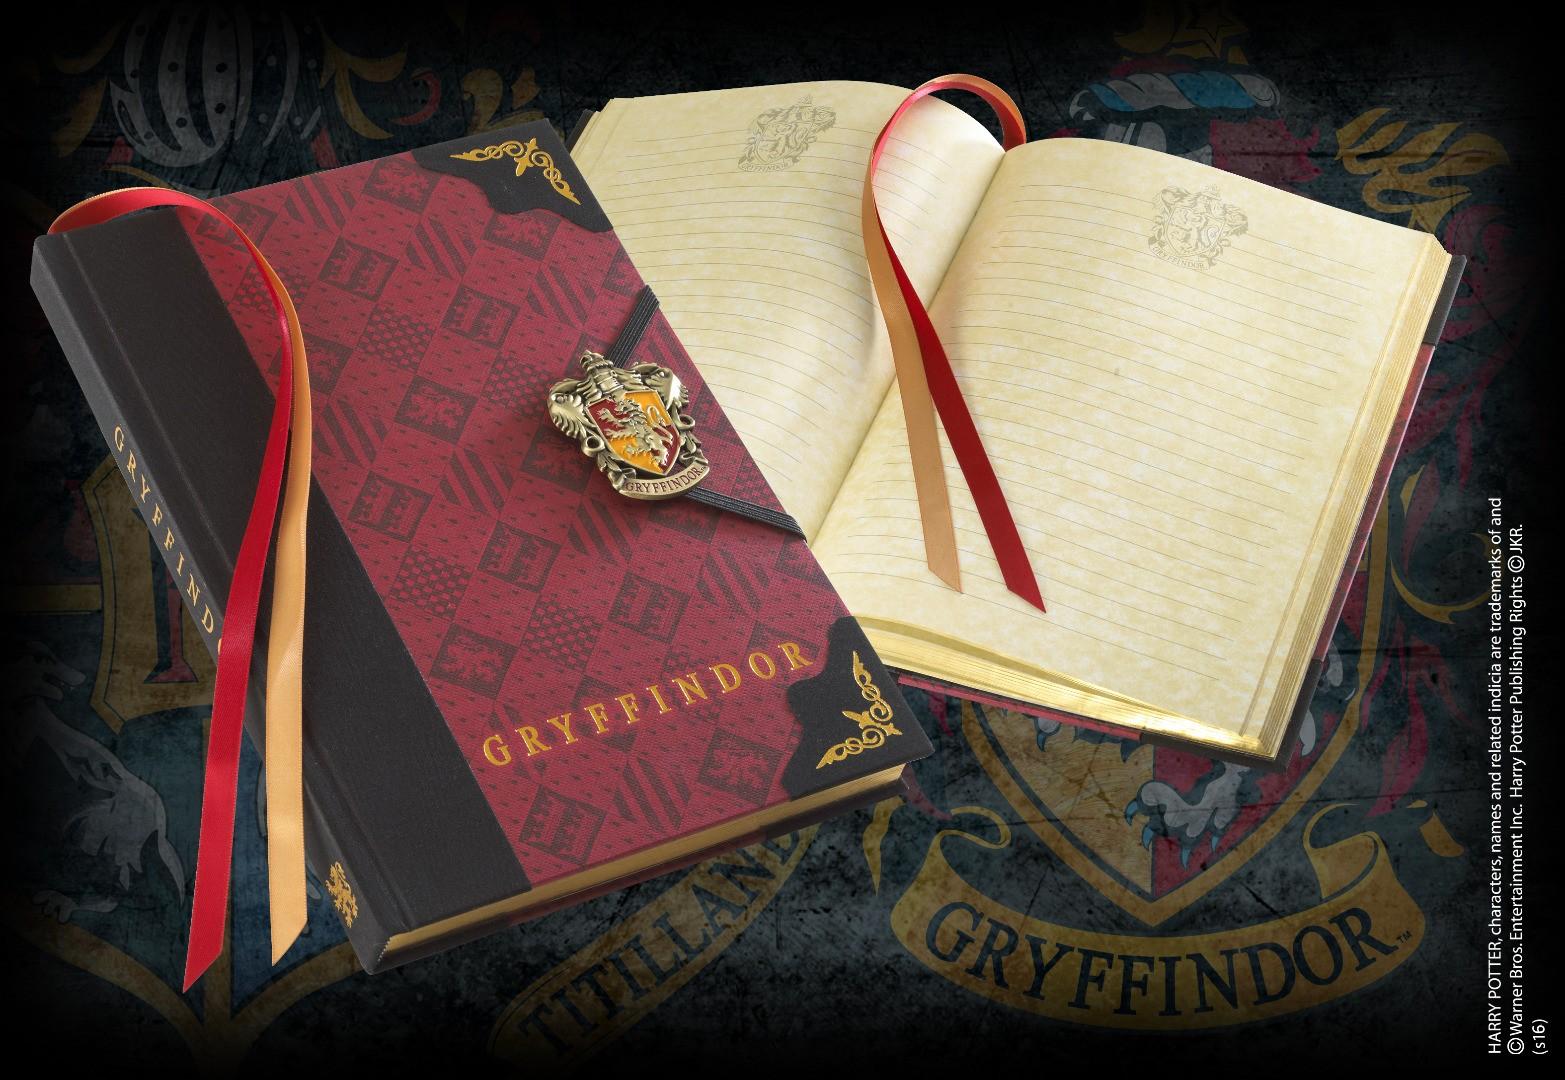 Gryffindor Journal With Enamel Metal Clasp